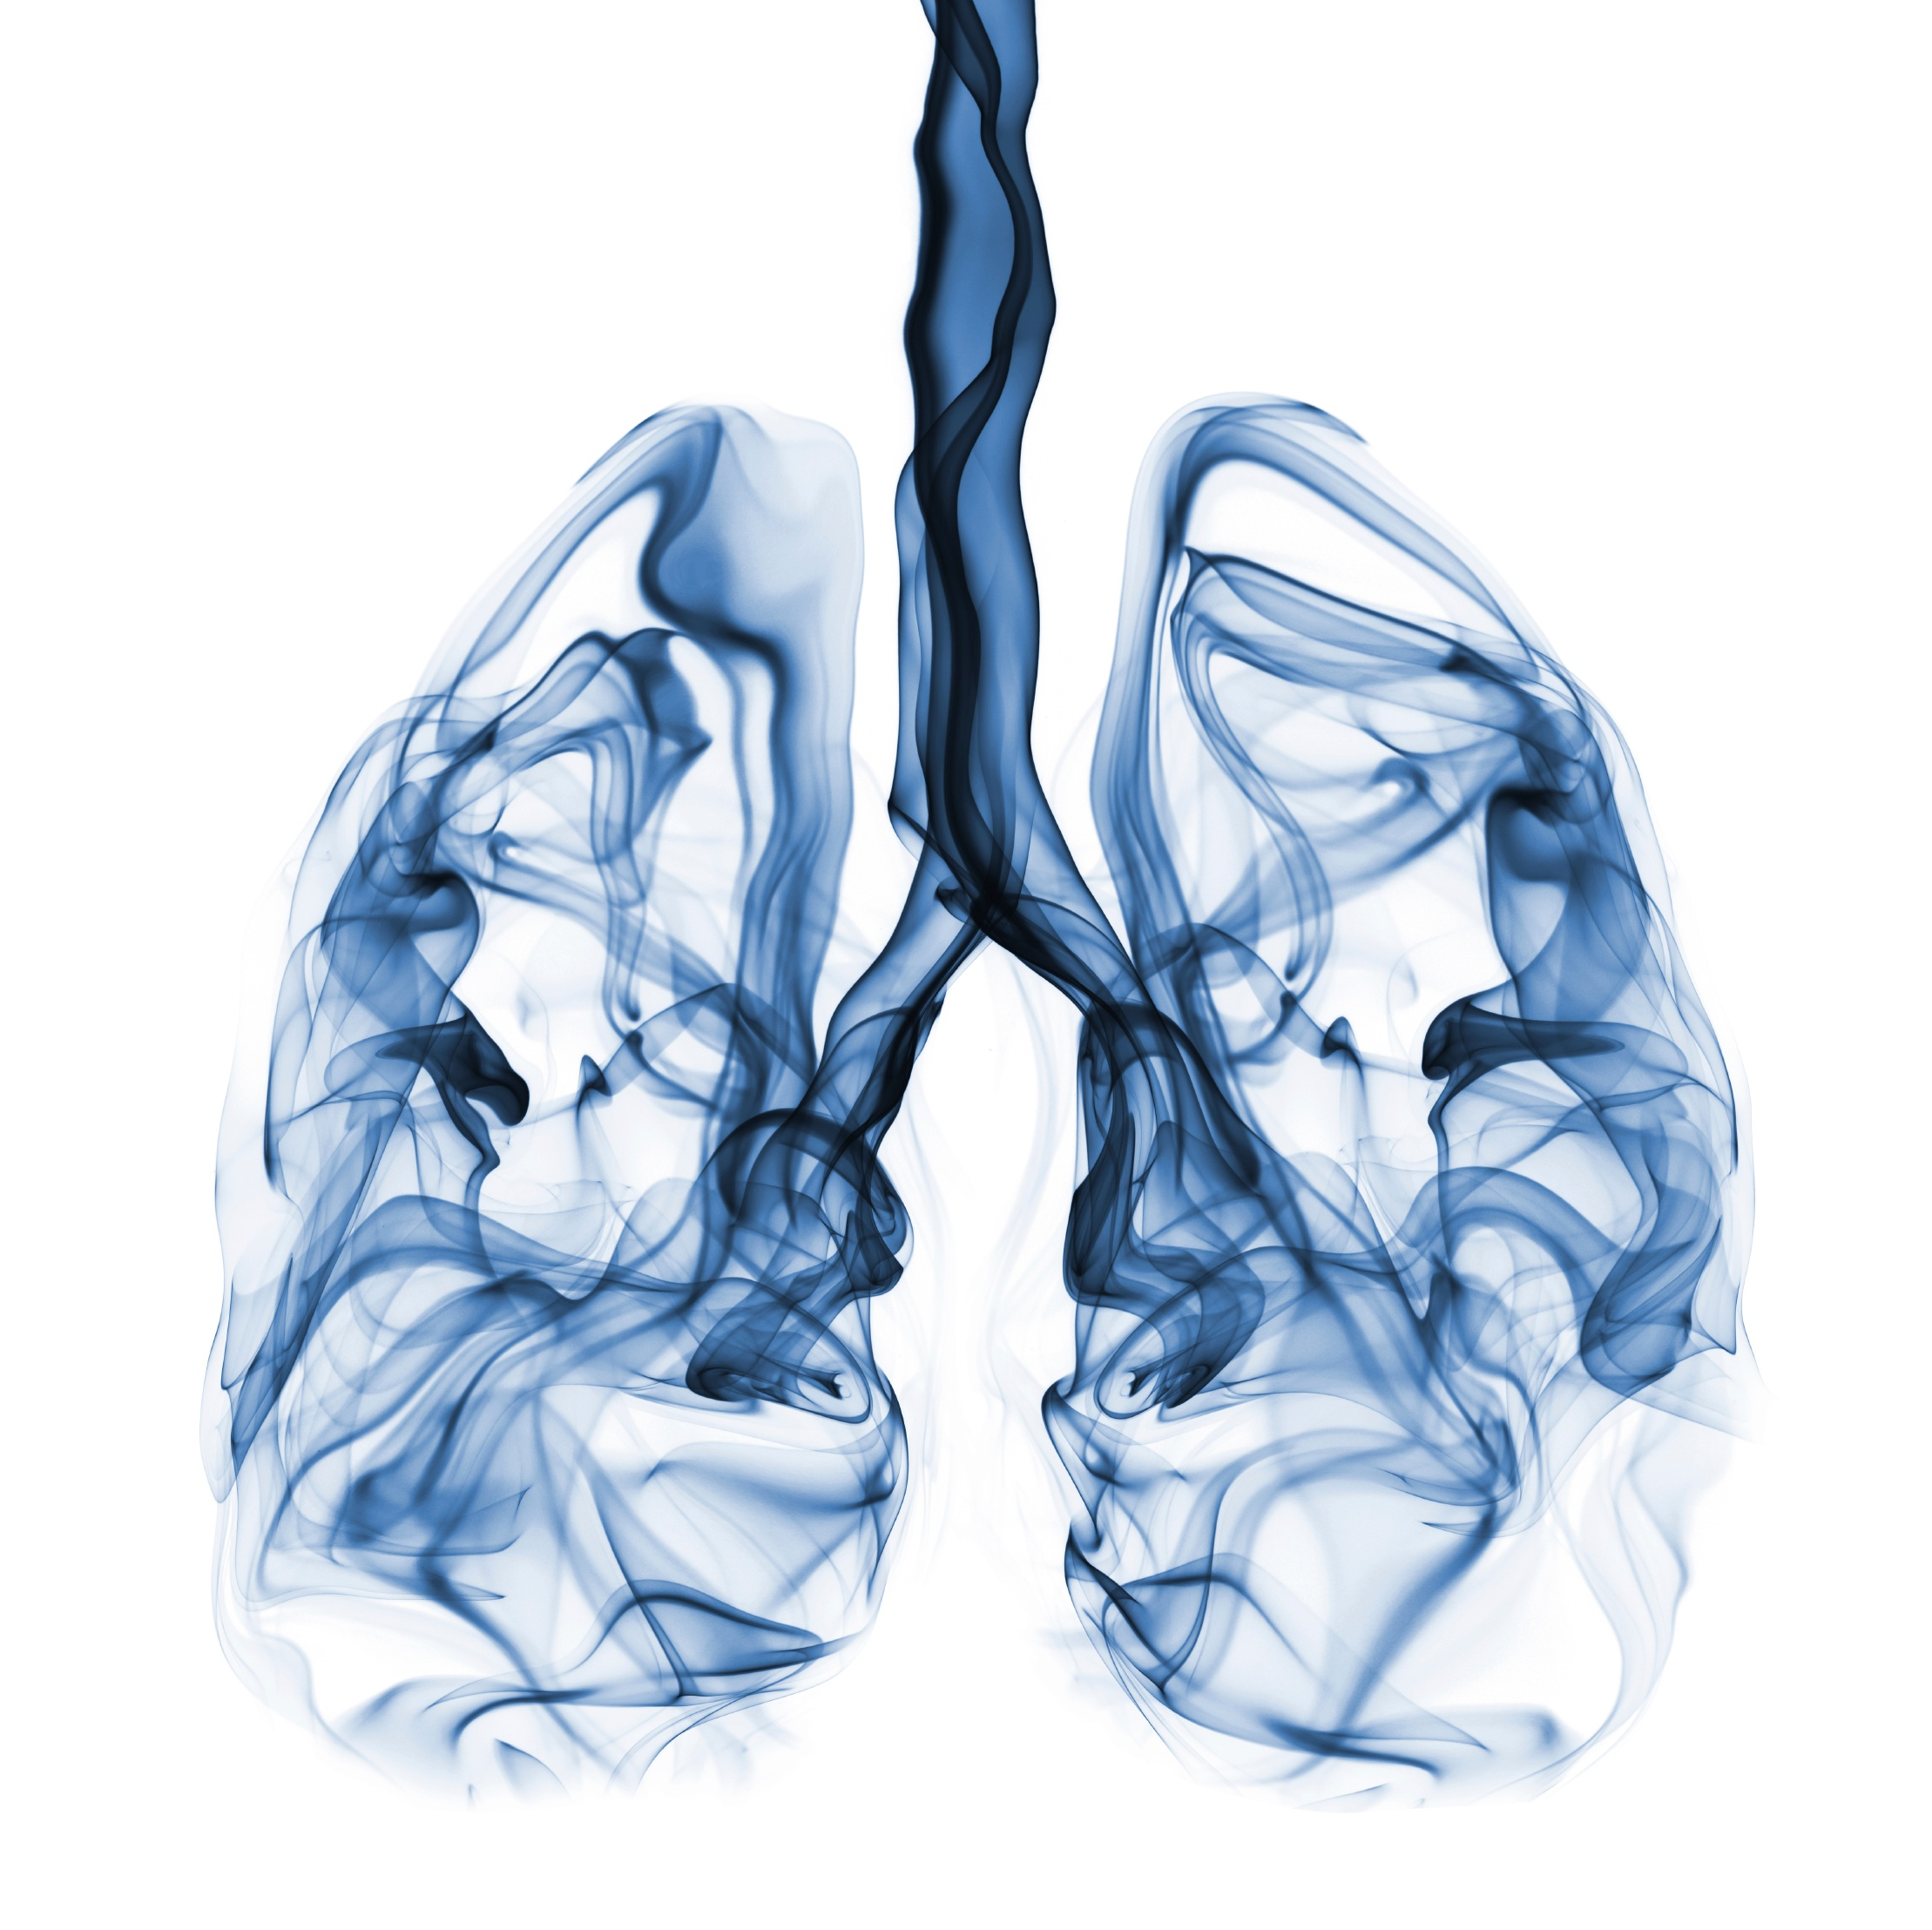 Akron Ohio Radon Removal. North Canton Ohio Radon Removal. Test for Radon. Ohio Radon Mitigation. Radon causes Lung Cancer.